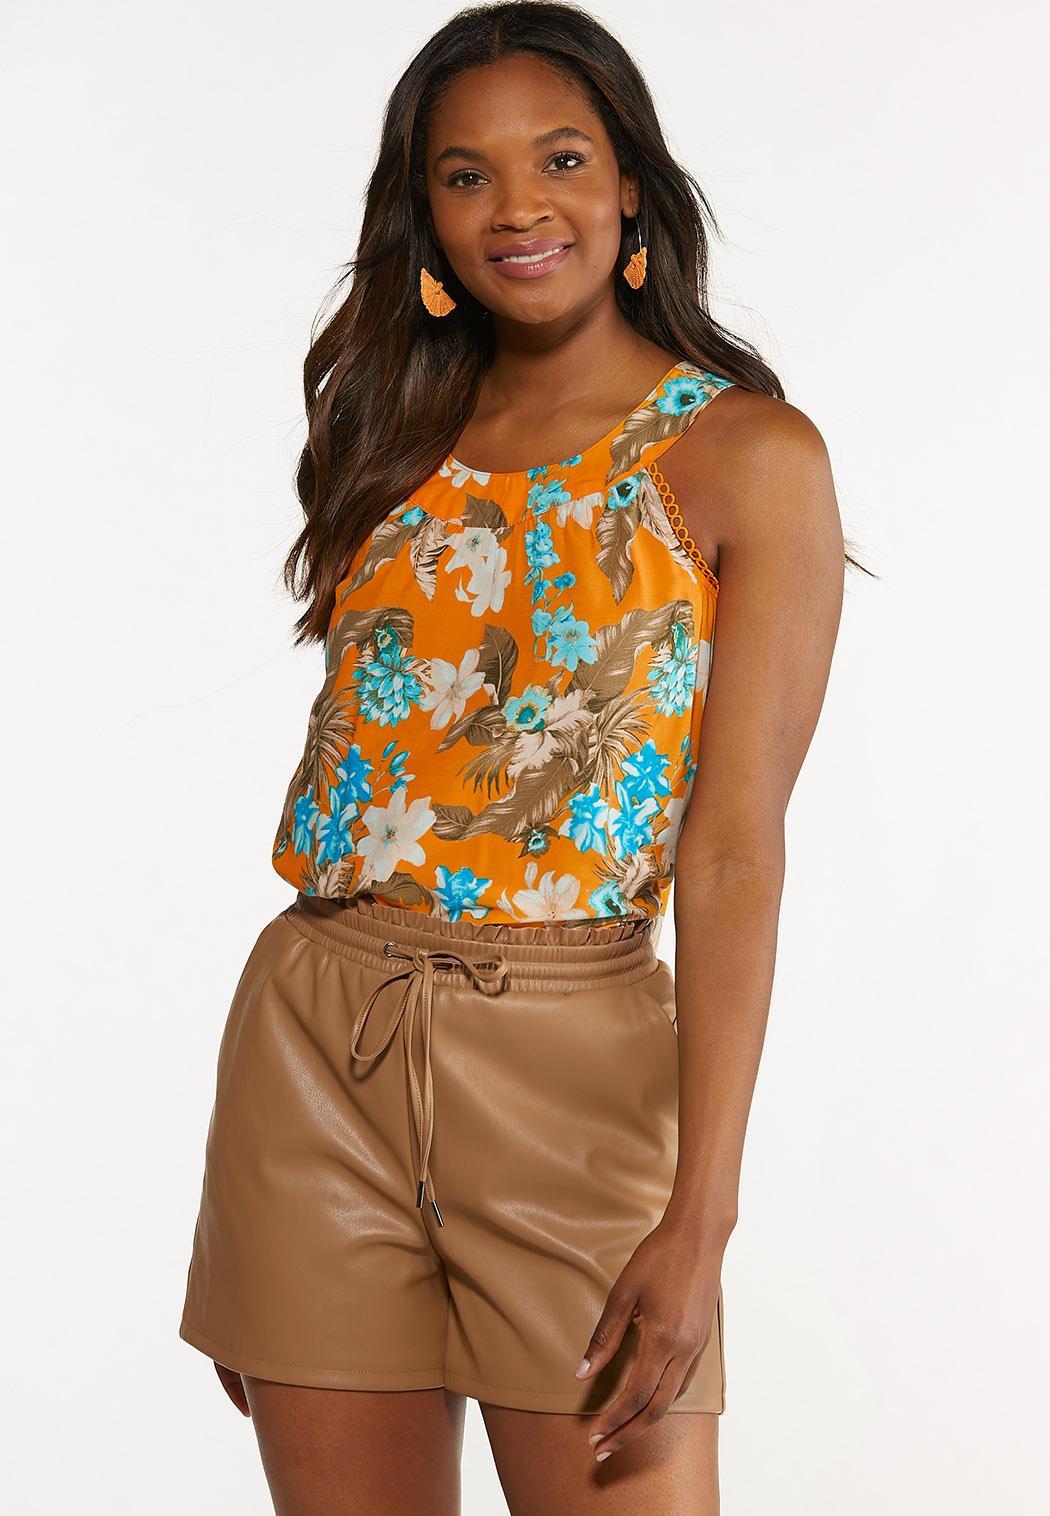 Apricot Floral Top (Item #44608922)